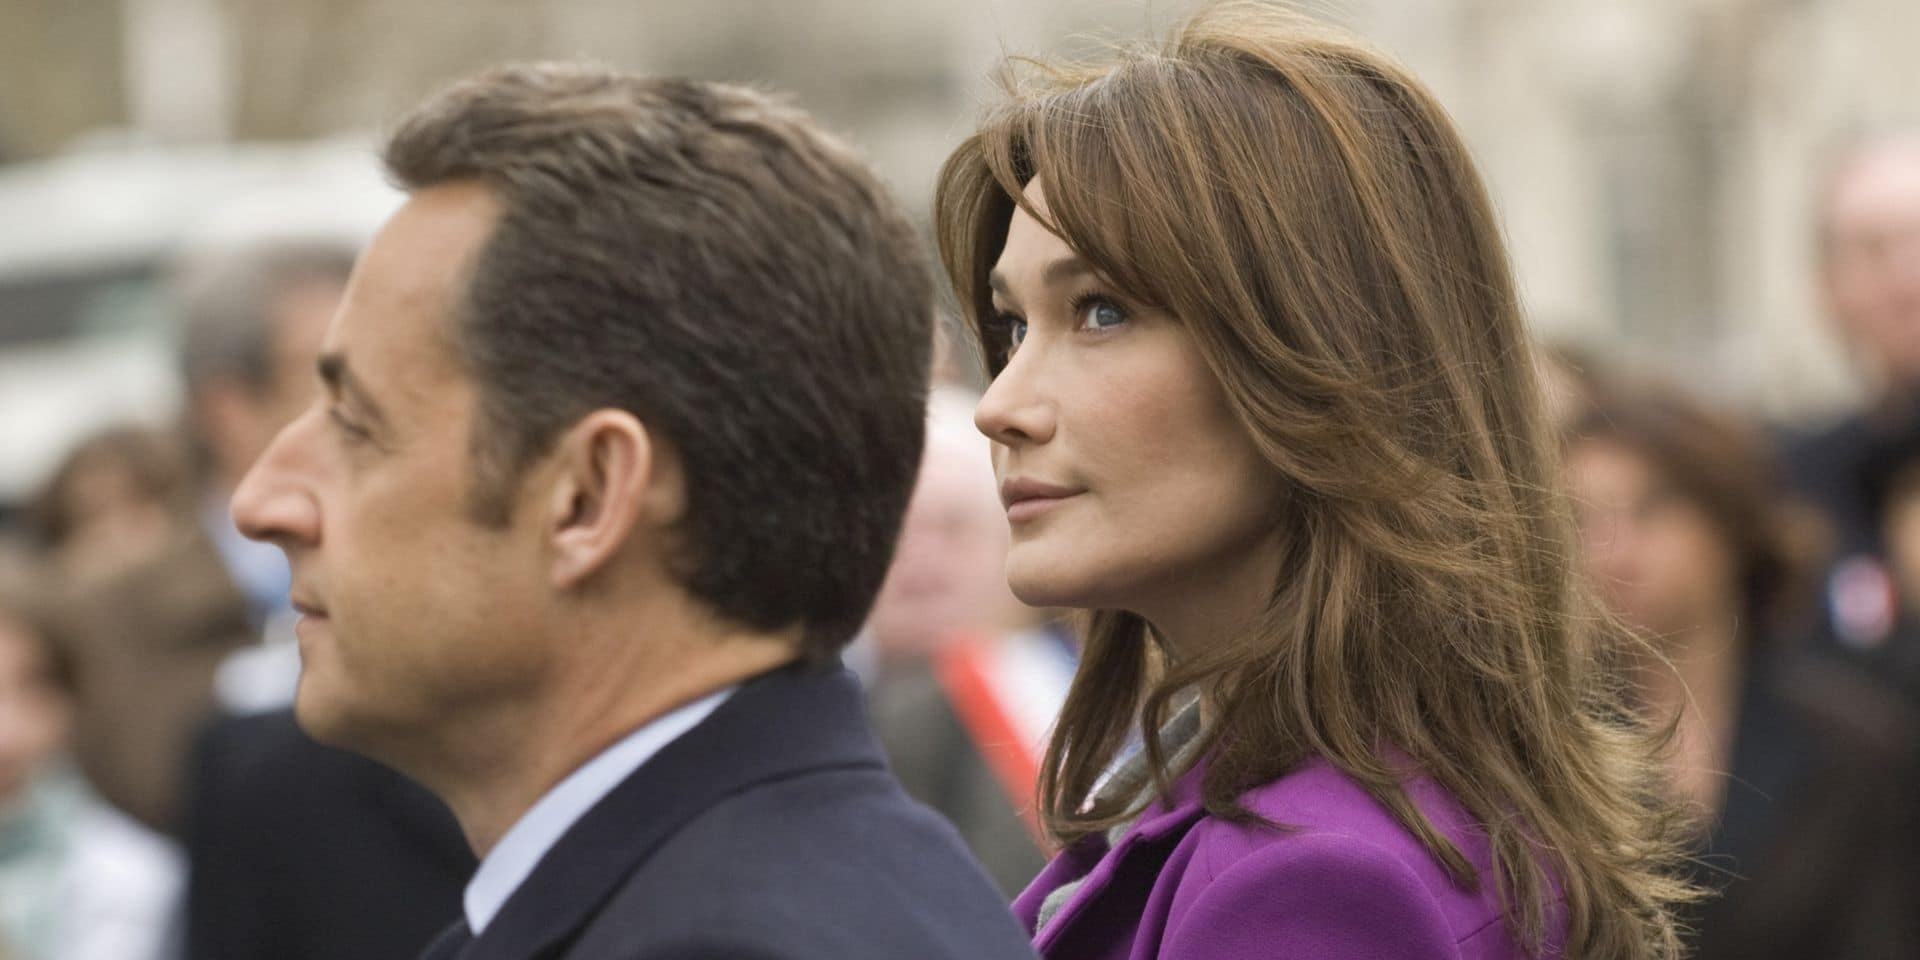 Pendant que son mari s'explique sur TF1, Carla Bruni poste une publication qui passe mal